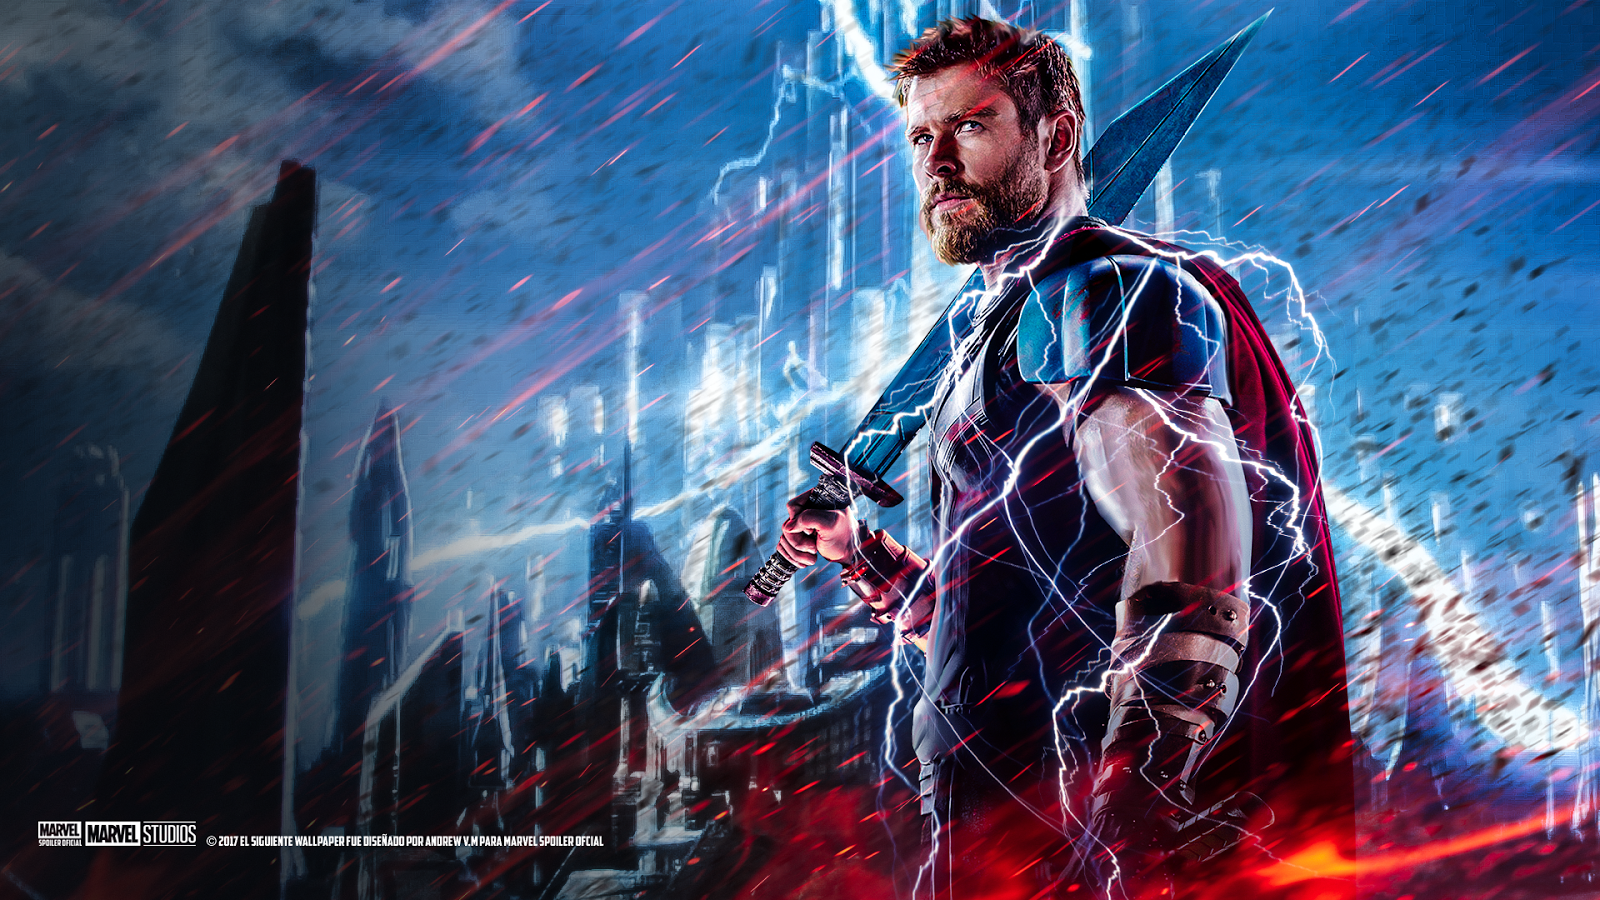 [32+] Thor: Ragnarok HD Wallpapers on WallpaperSafari